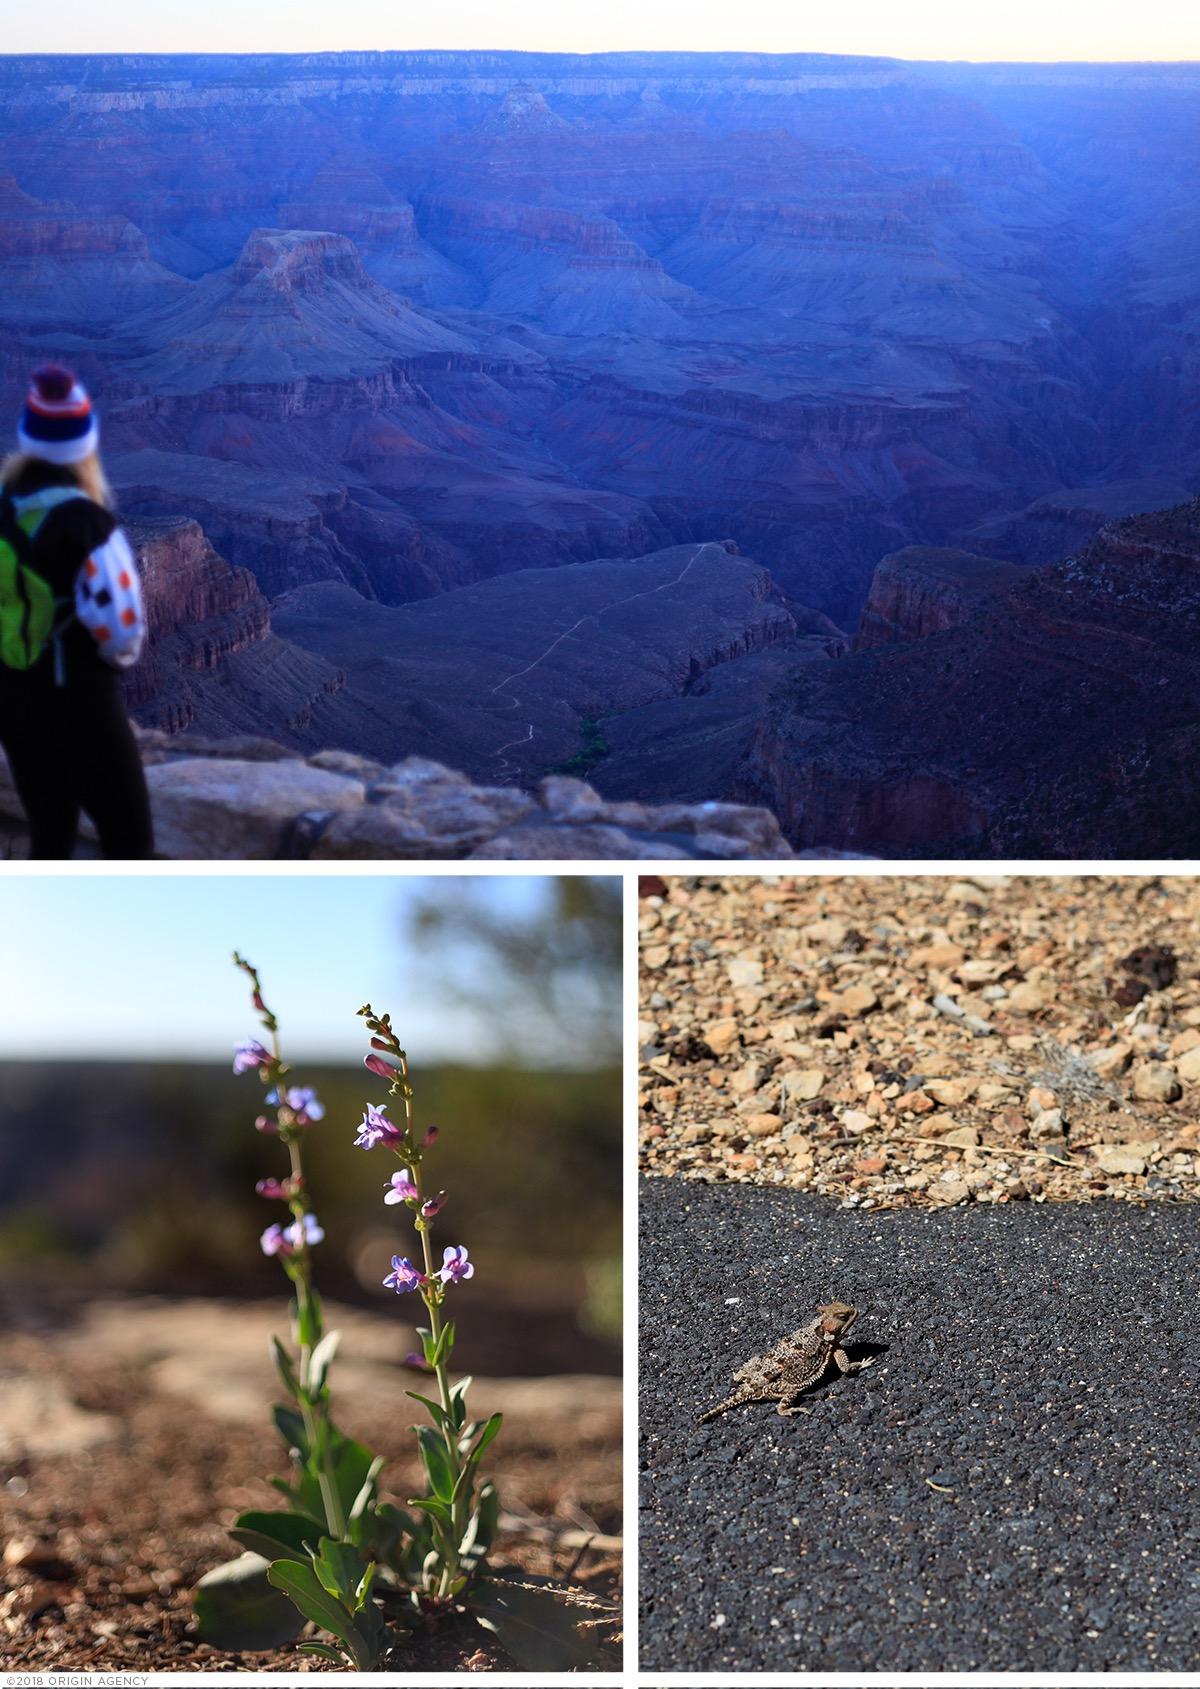 origin-agency-grand-canyon-rim-trail-morning.jpg